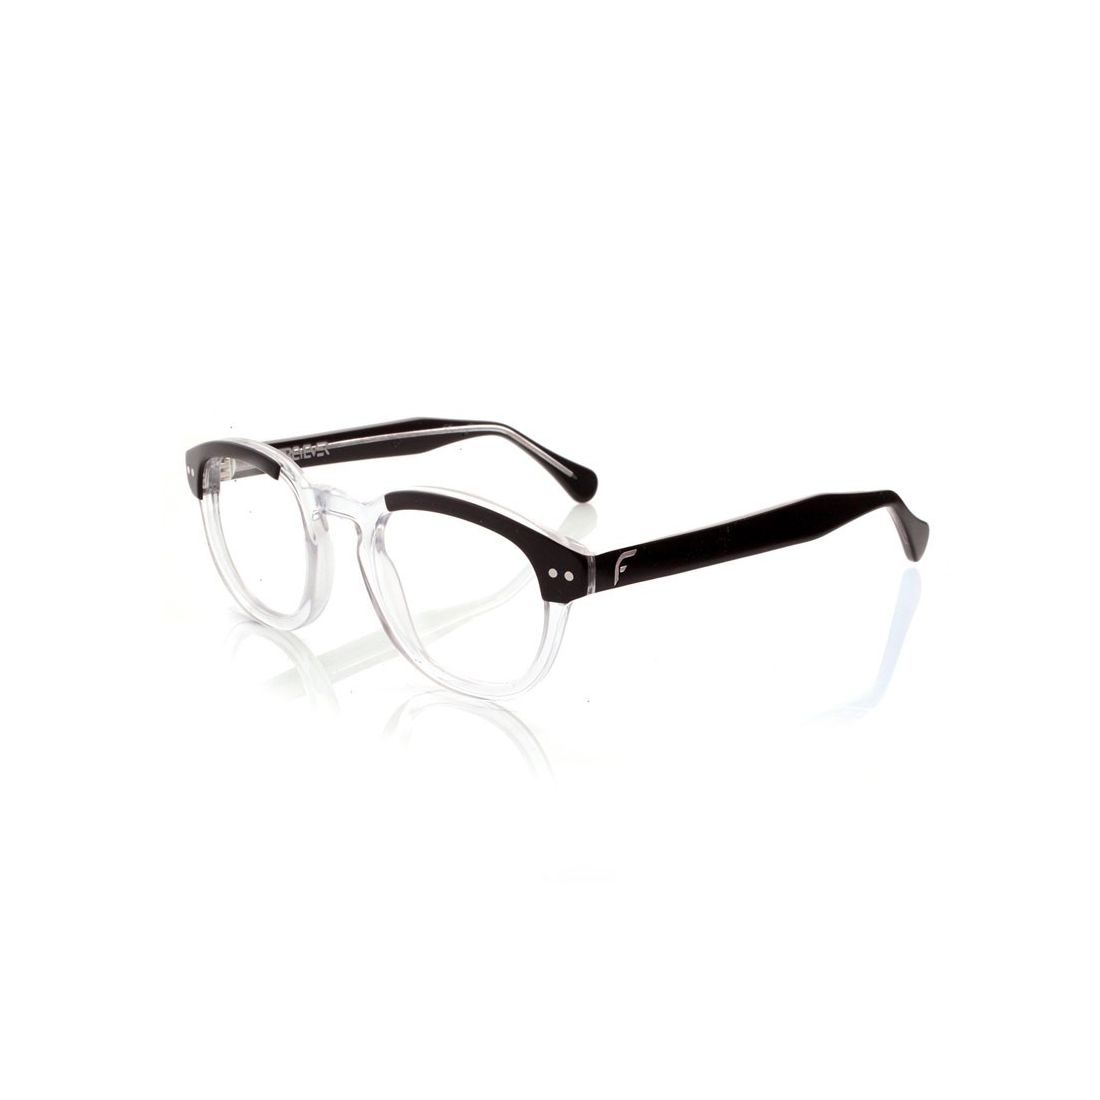 9dfb4267cde acetate frame for prescription glasses for woman man